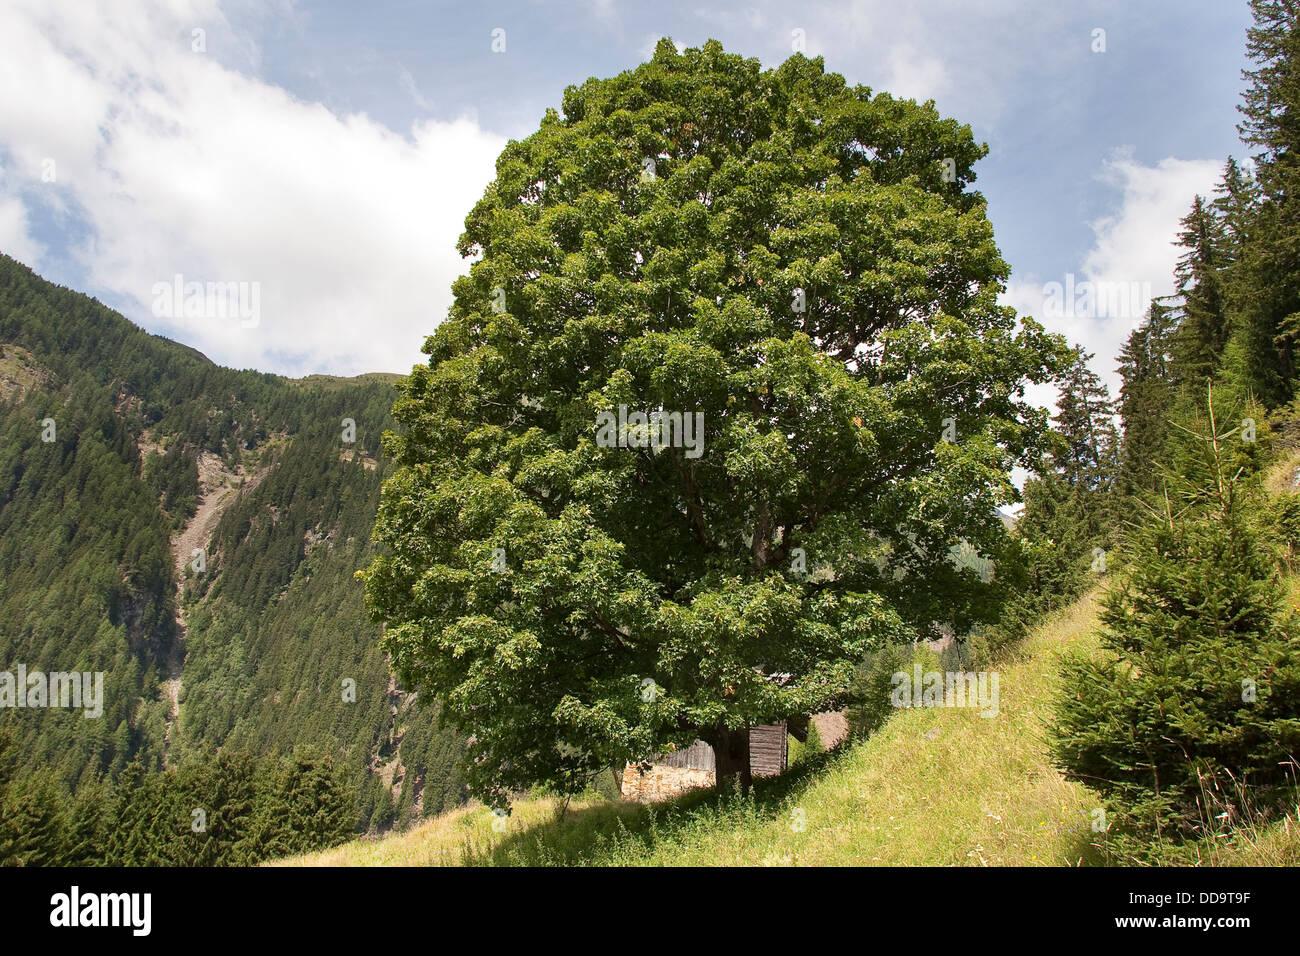 Sycamore, Erable sycomore, maple, Bergahorn, Berg-Ahorn, Ahorn, Acer pseudoplatanus Stock Photo